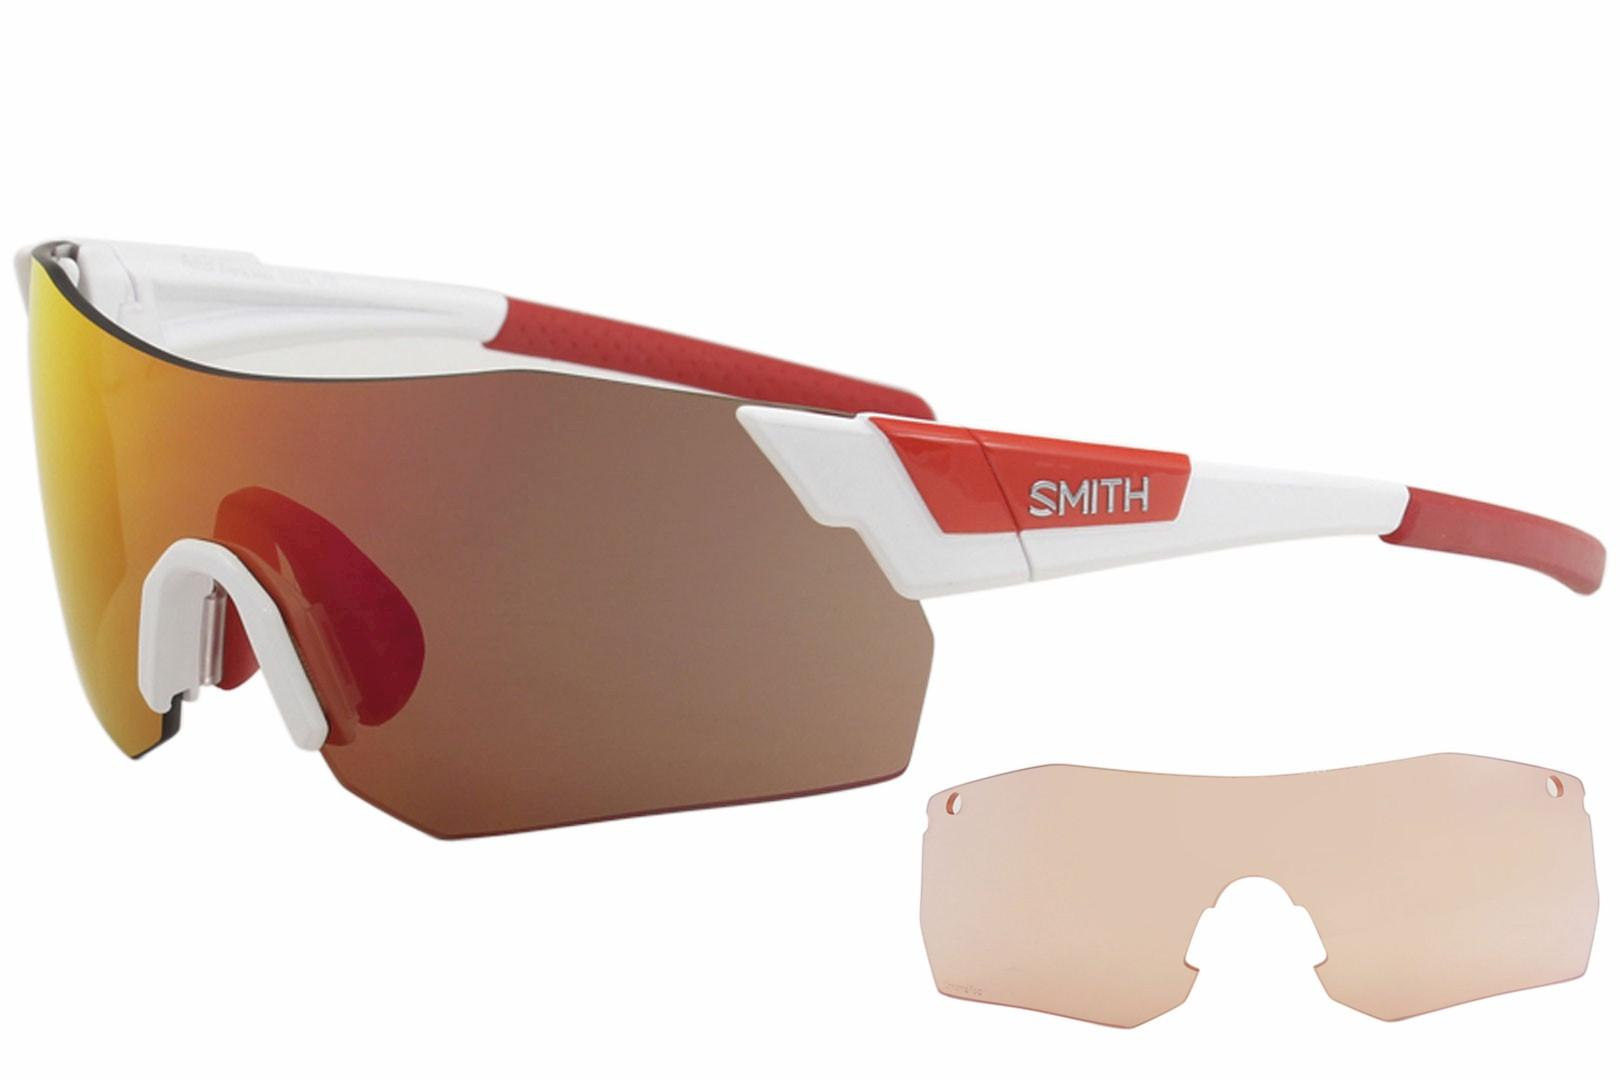 Image of Smith Optics Pivlock Arena Max X6 Fashion Shield Sunglasses - White Red/Red Mirrored - Lens 130 Bridge 0 Temple 120mm